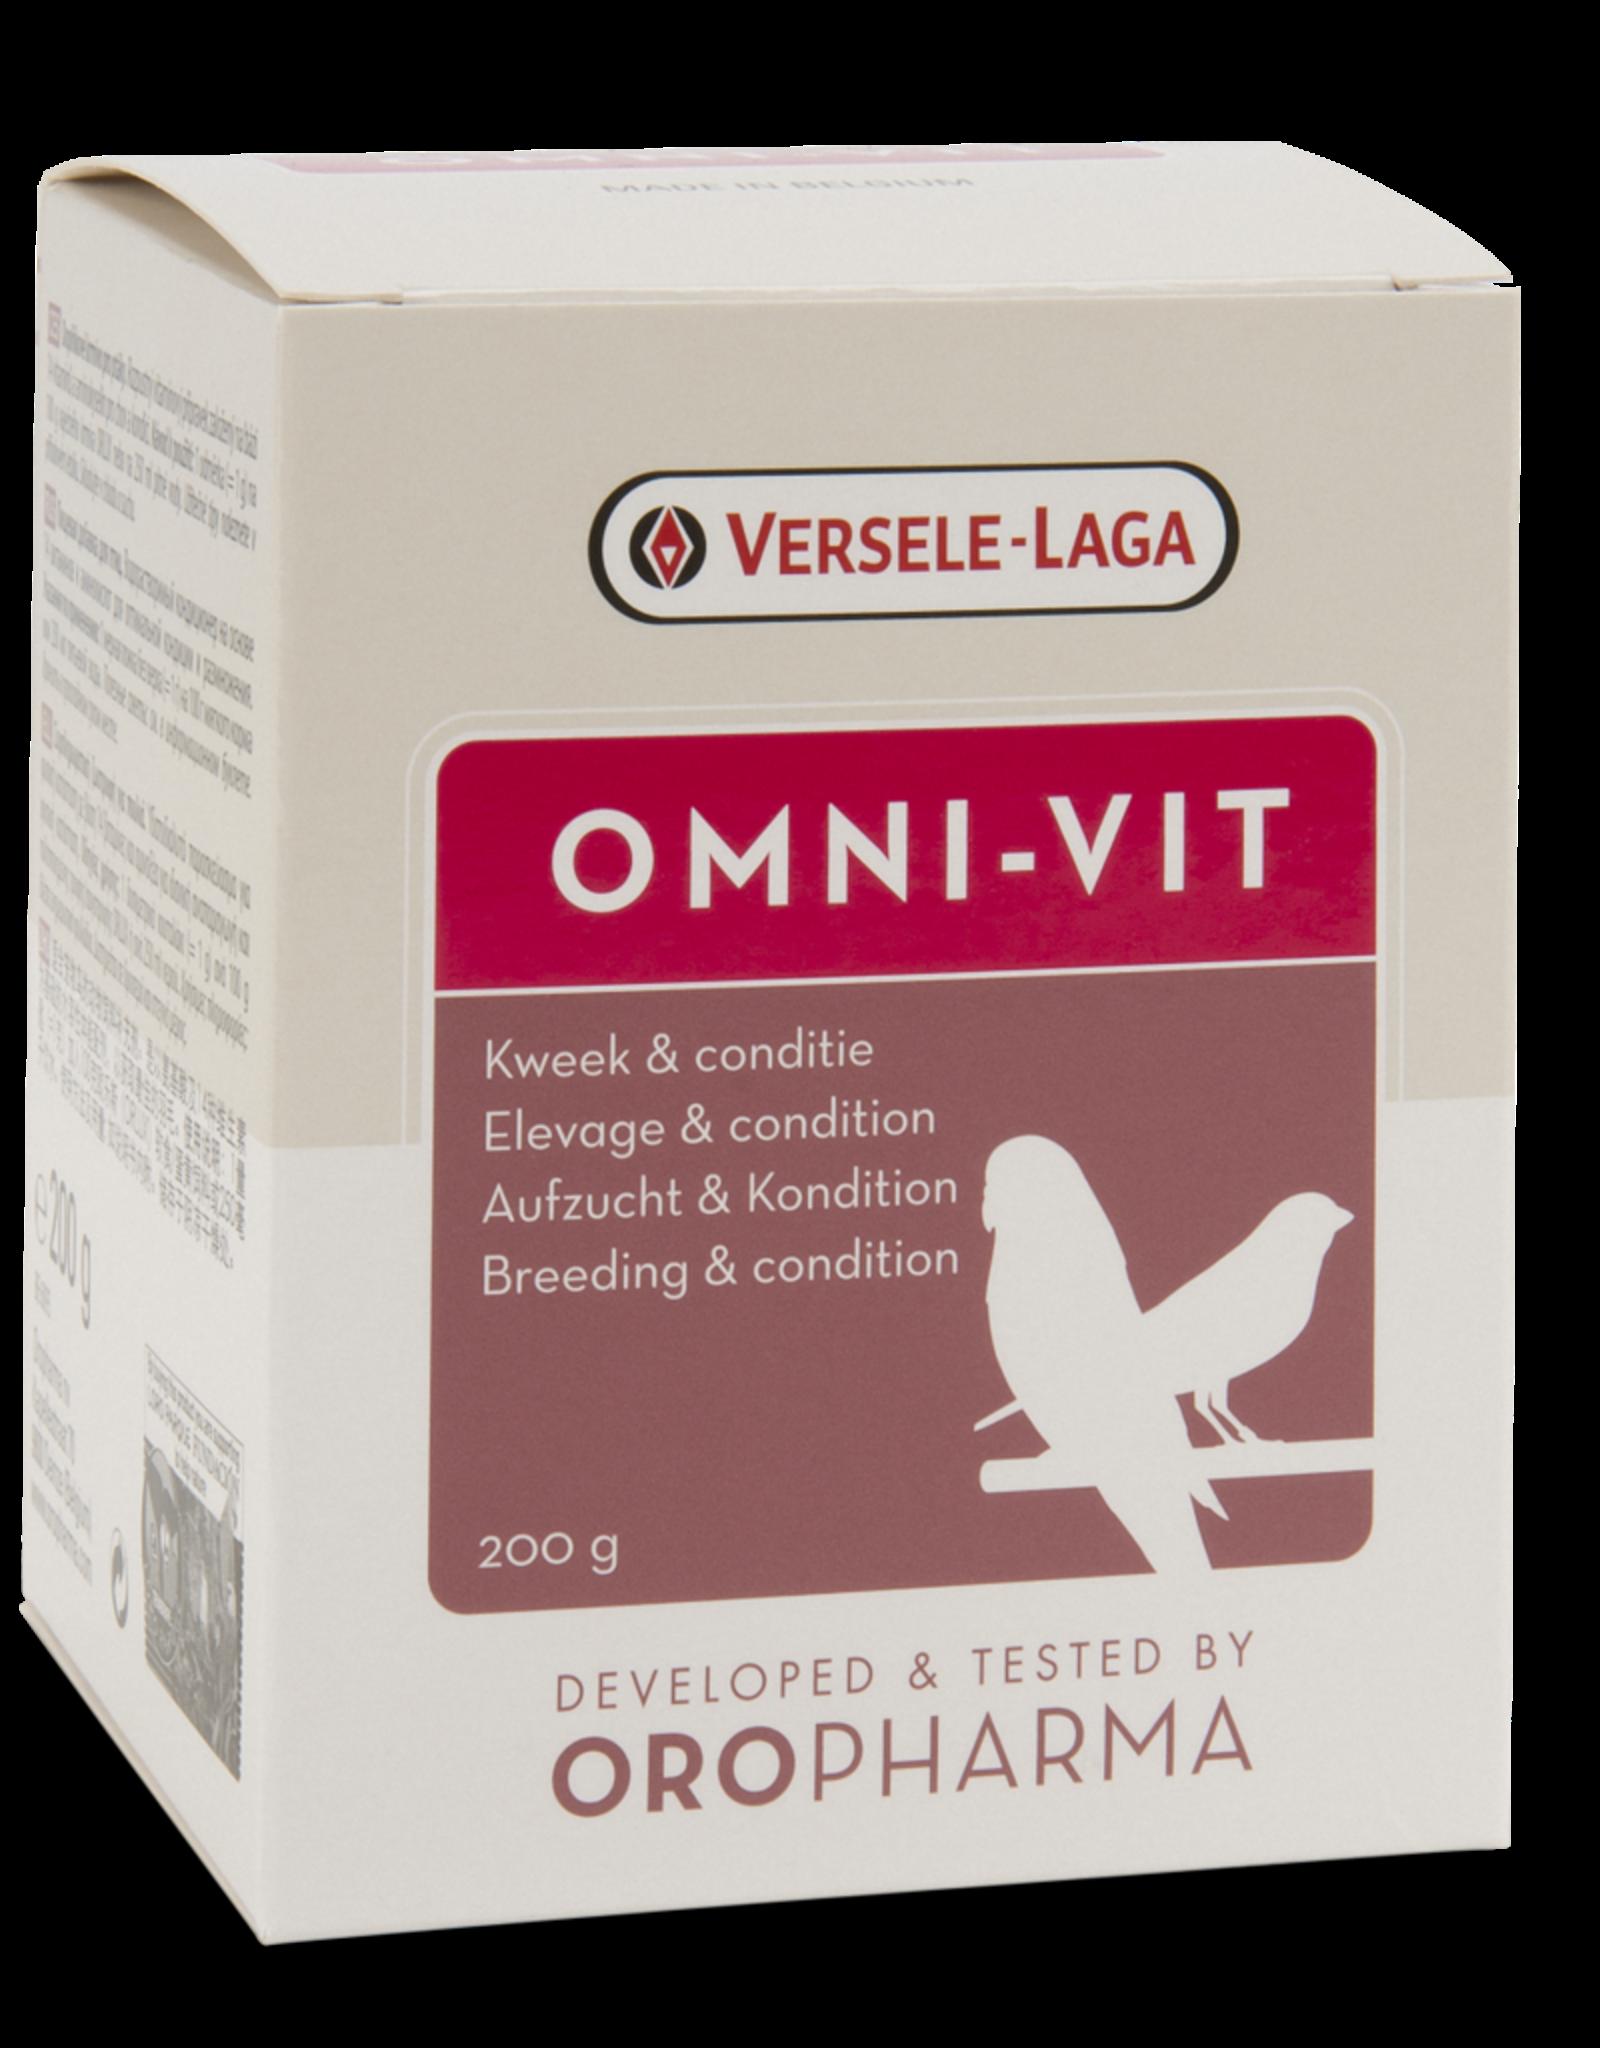 Oropharma Omni-vit kweek & conditie - 200 Gram